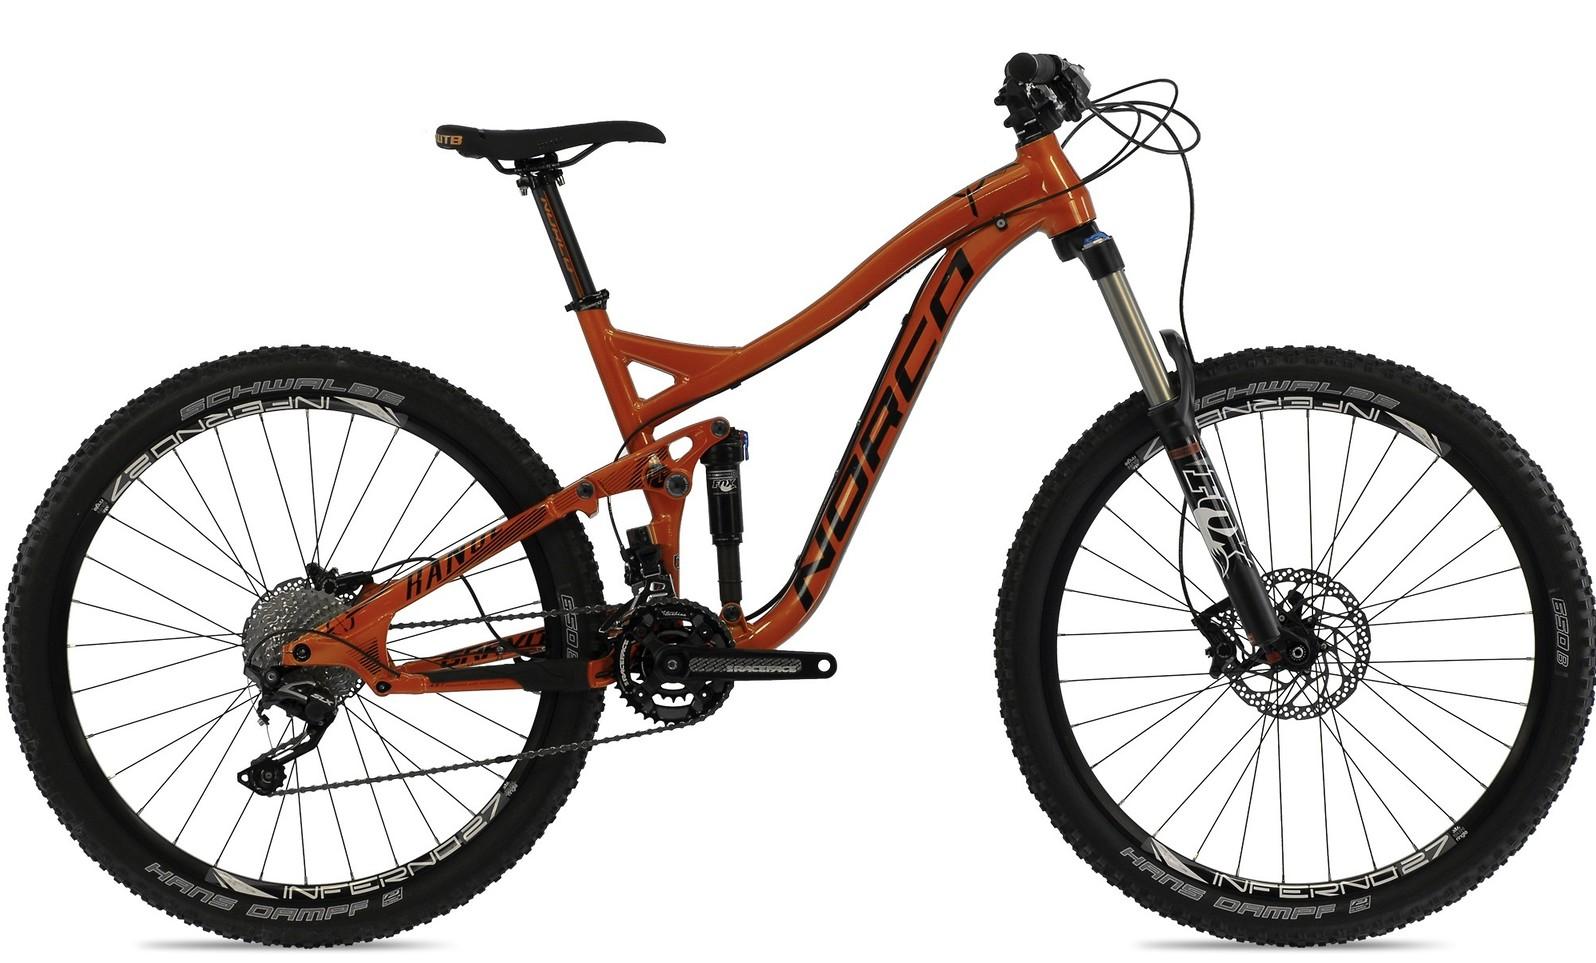 bike - 2014 Norco Range Alloy 7.1